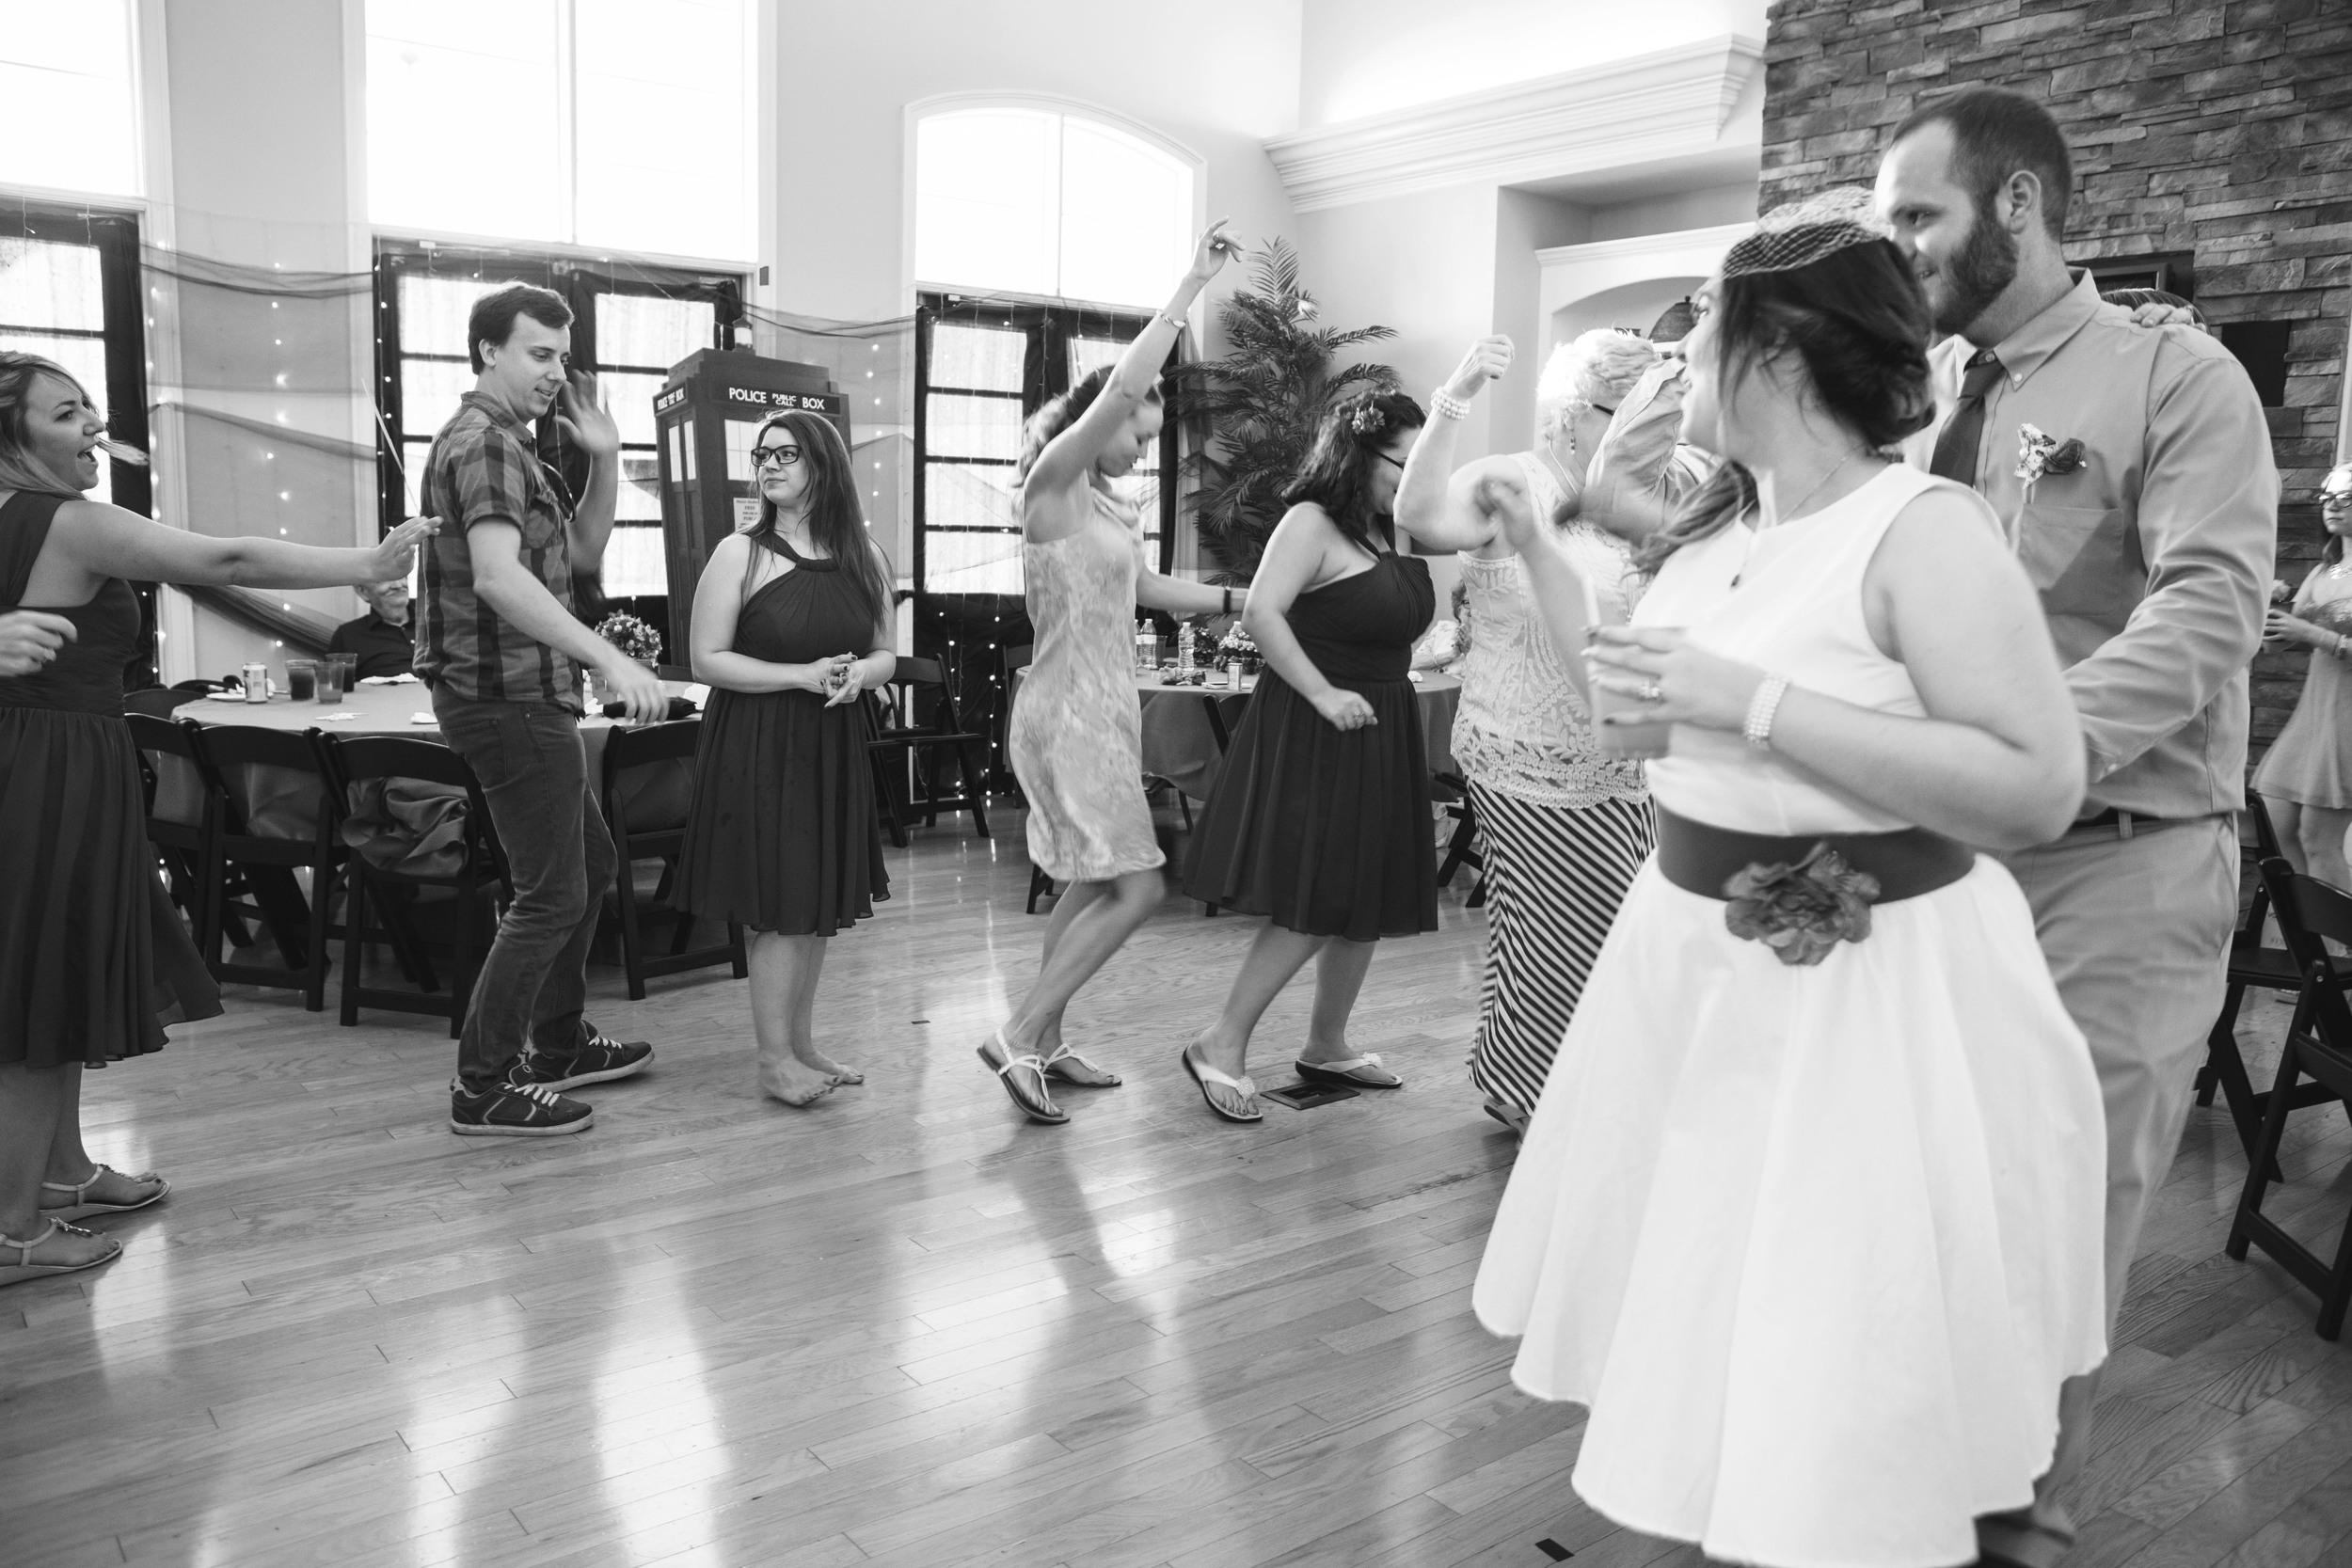 Leland_Wedding_Photographer_Tiffany_Abruzzo_Reception_111.jpg